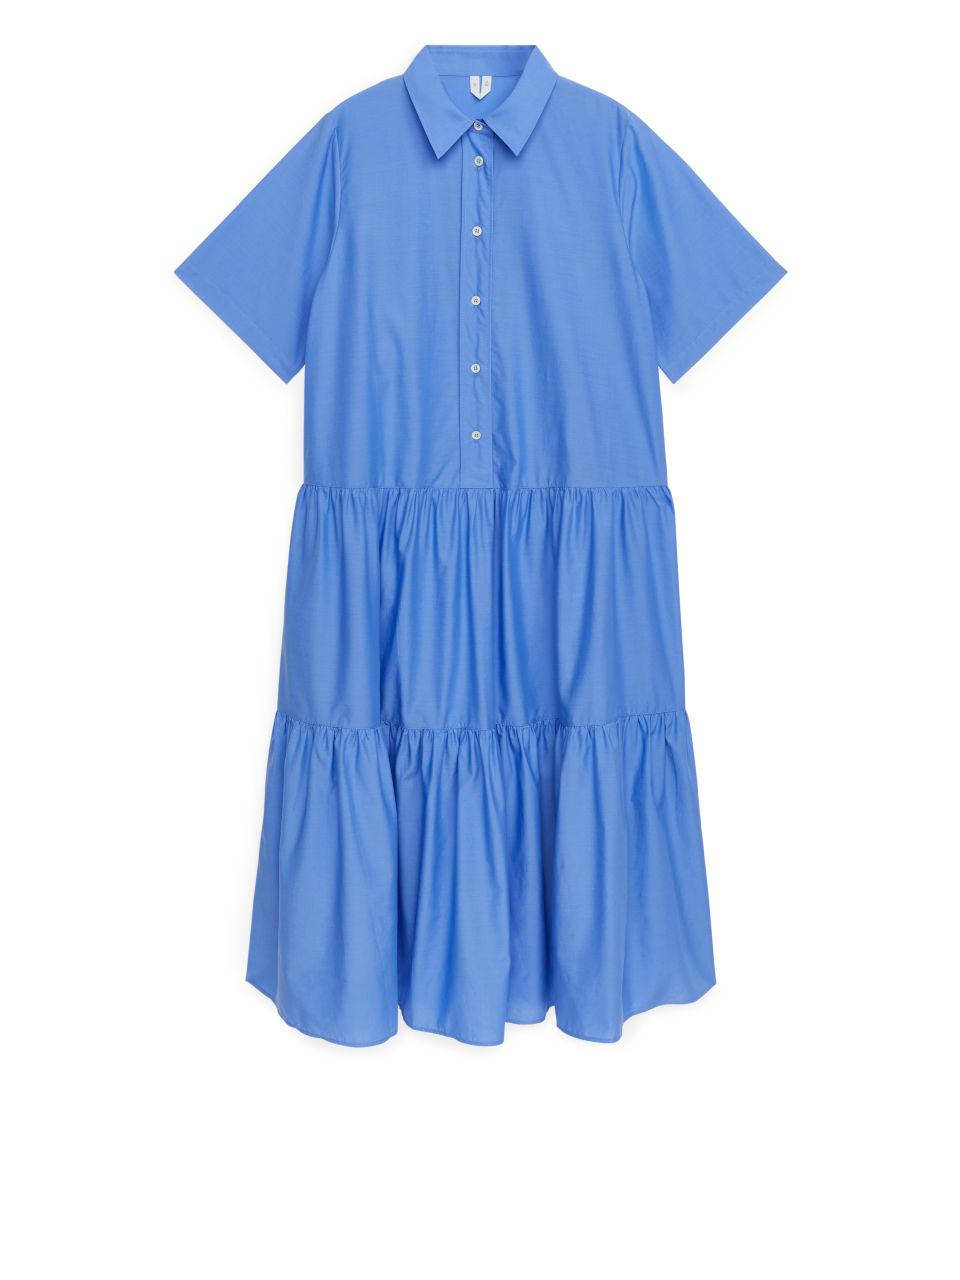 Cotton Lyocell Tier Dress - Blue